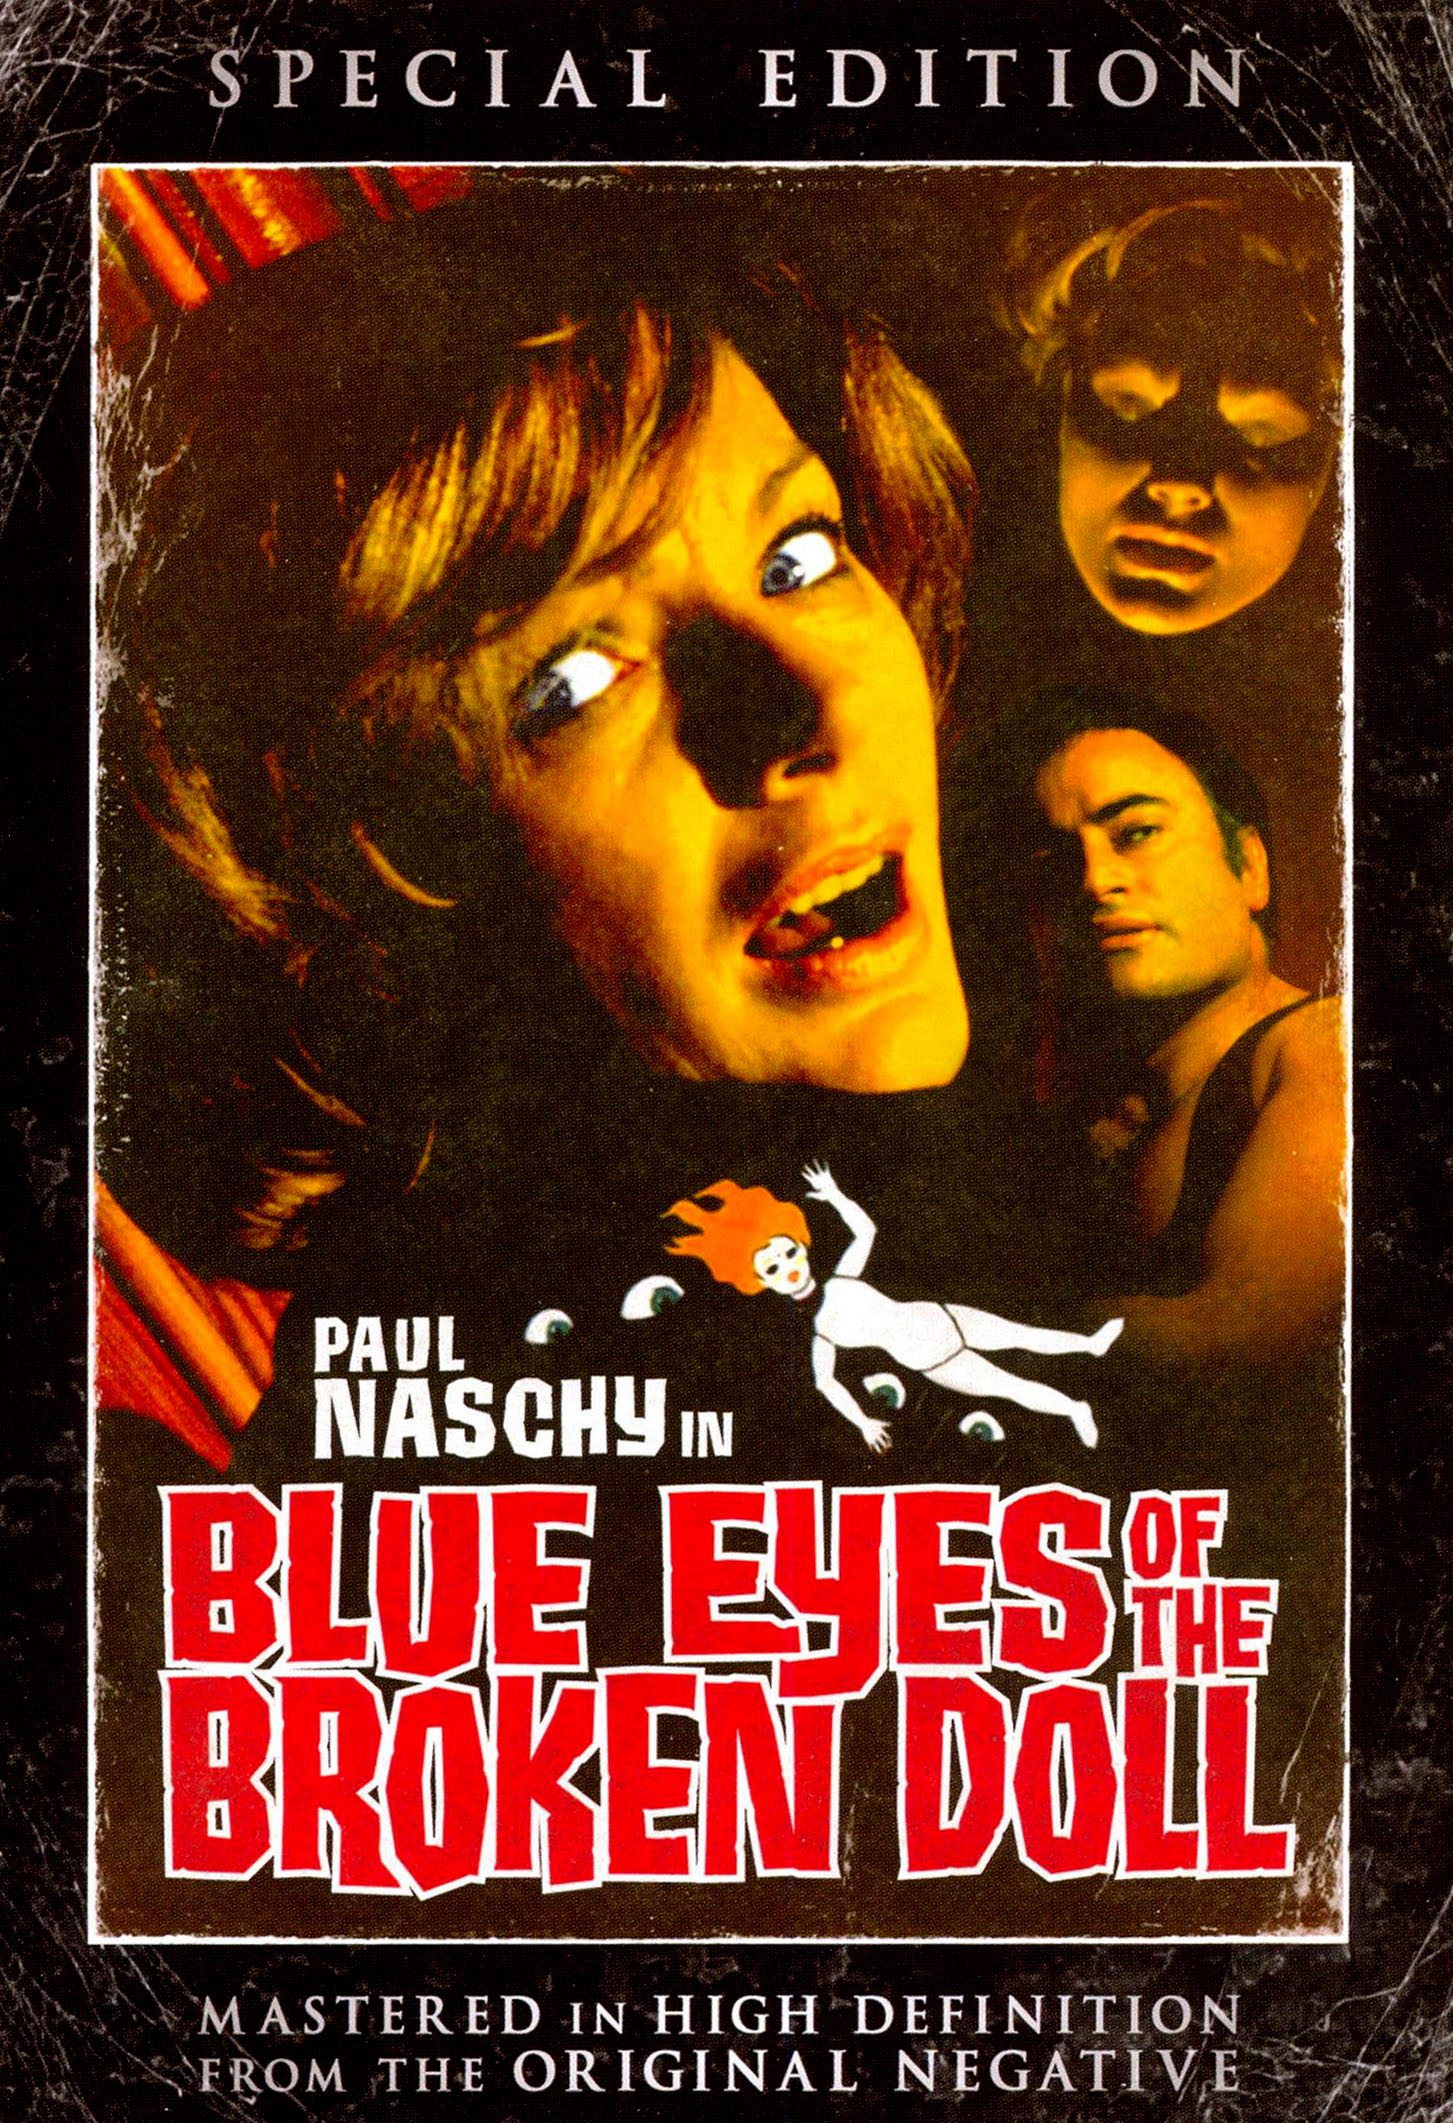 Blue Eyes of the Broken Doll